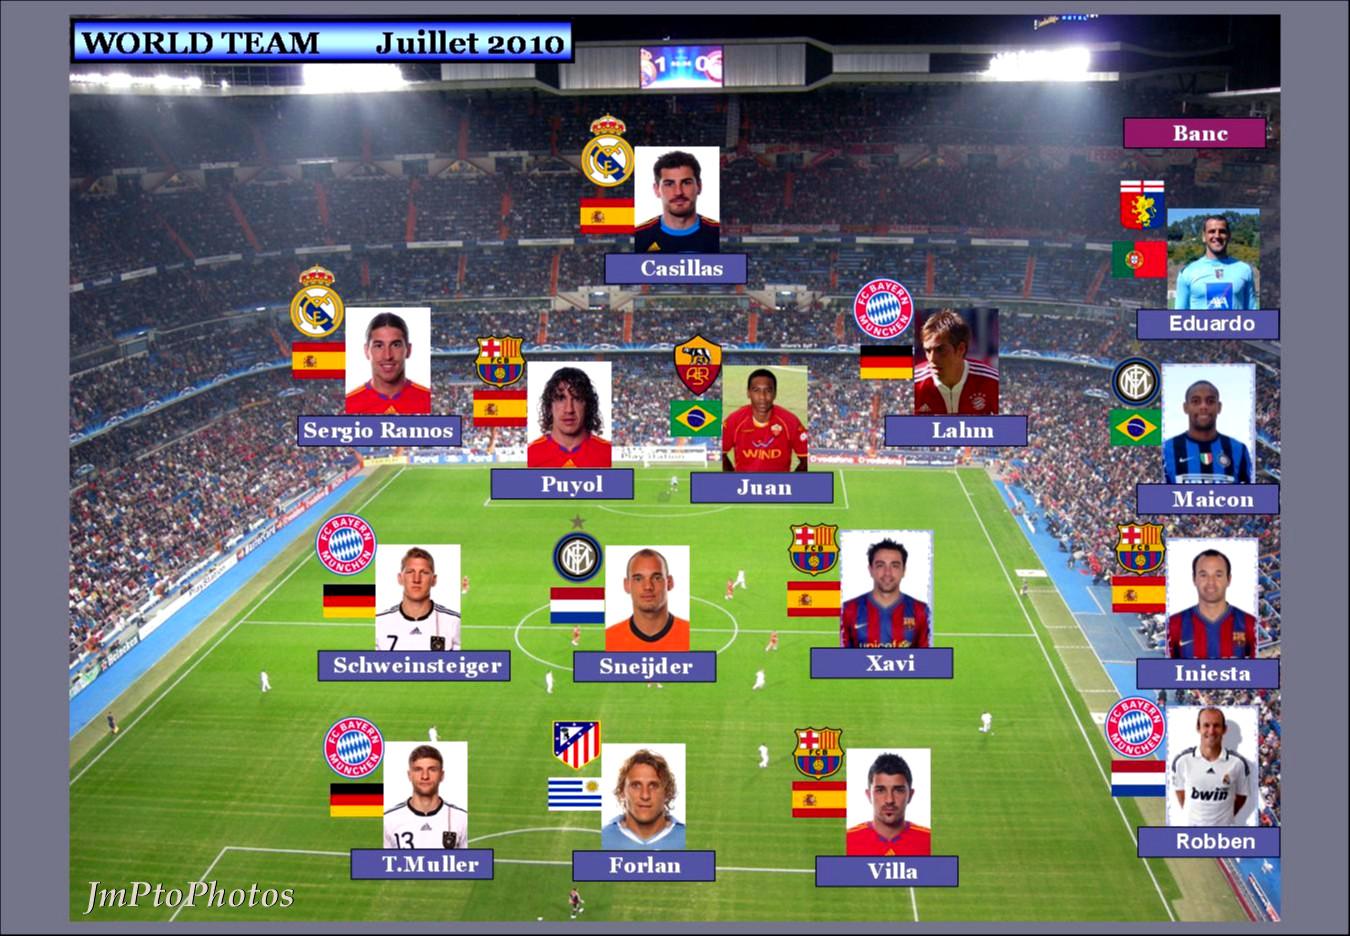 Jmptophotos football world team juillet 2010 - Jeu de foot coupe du monde ...